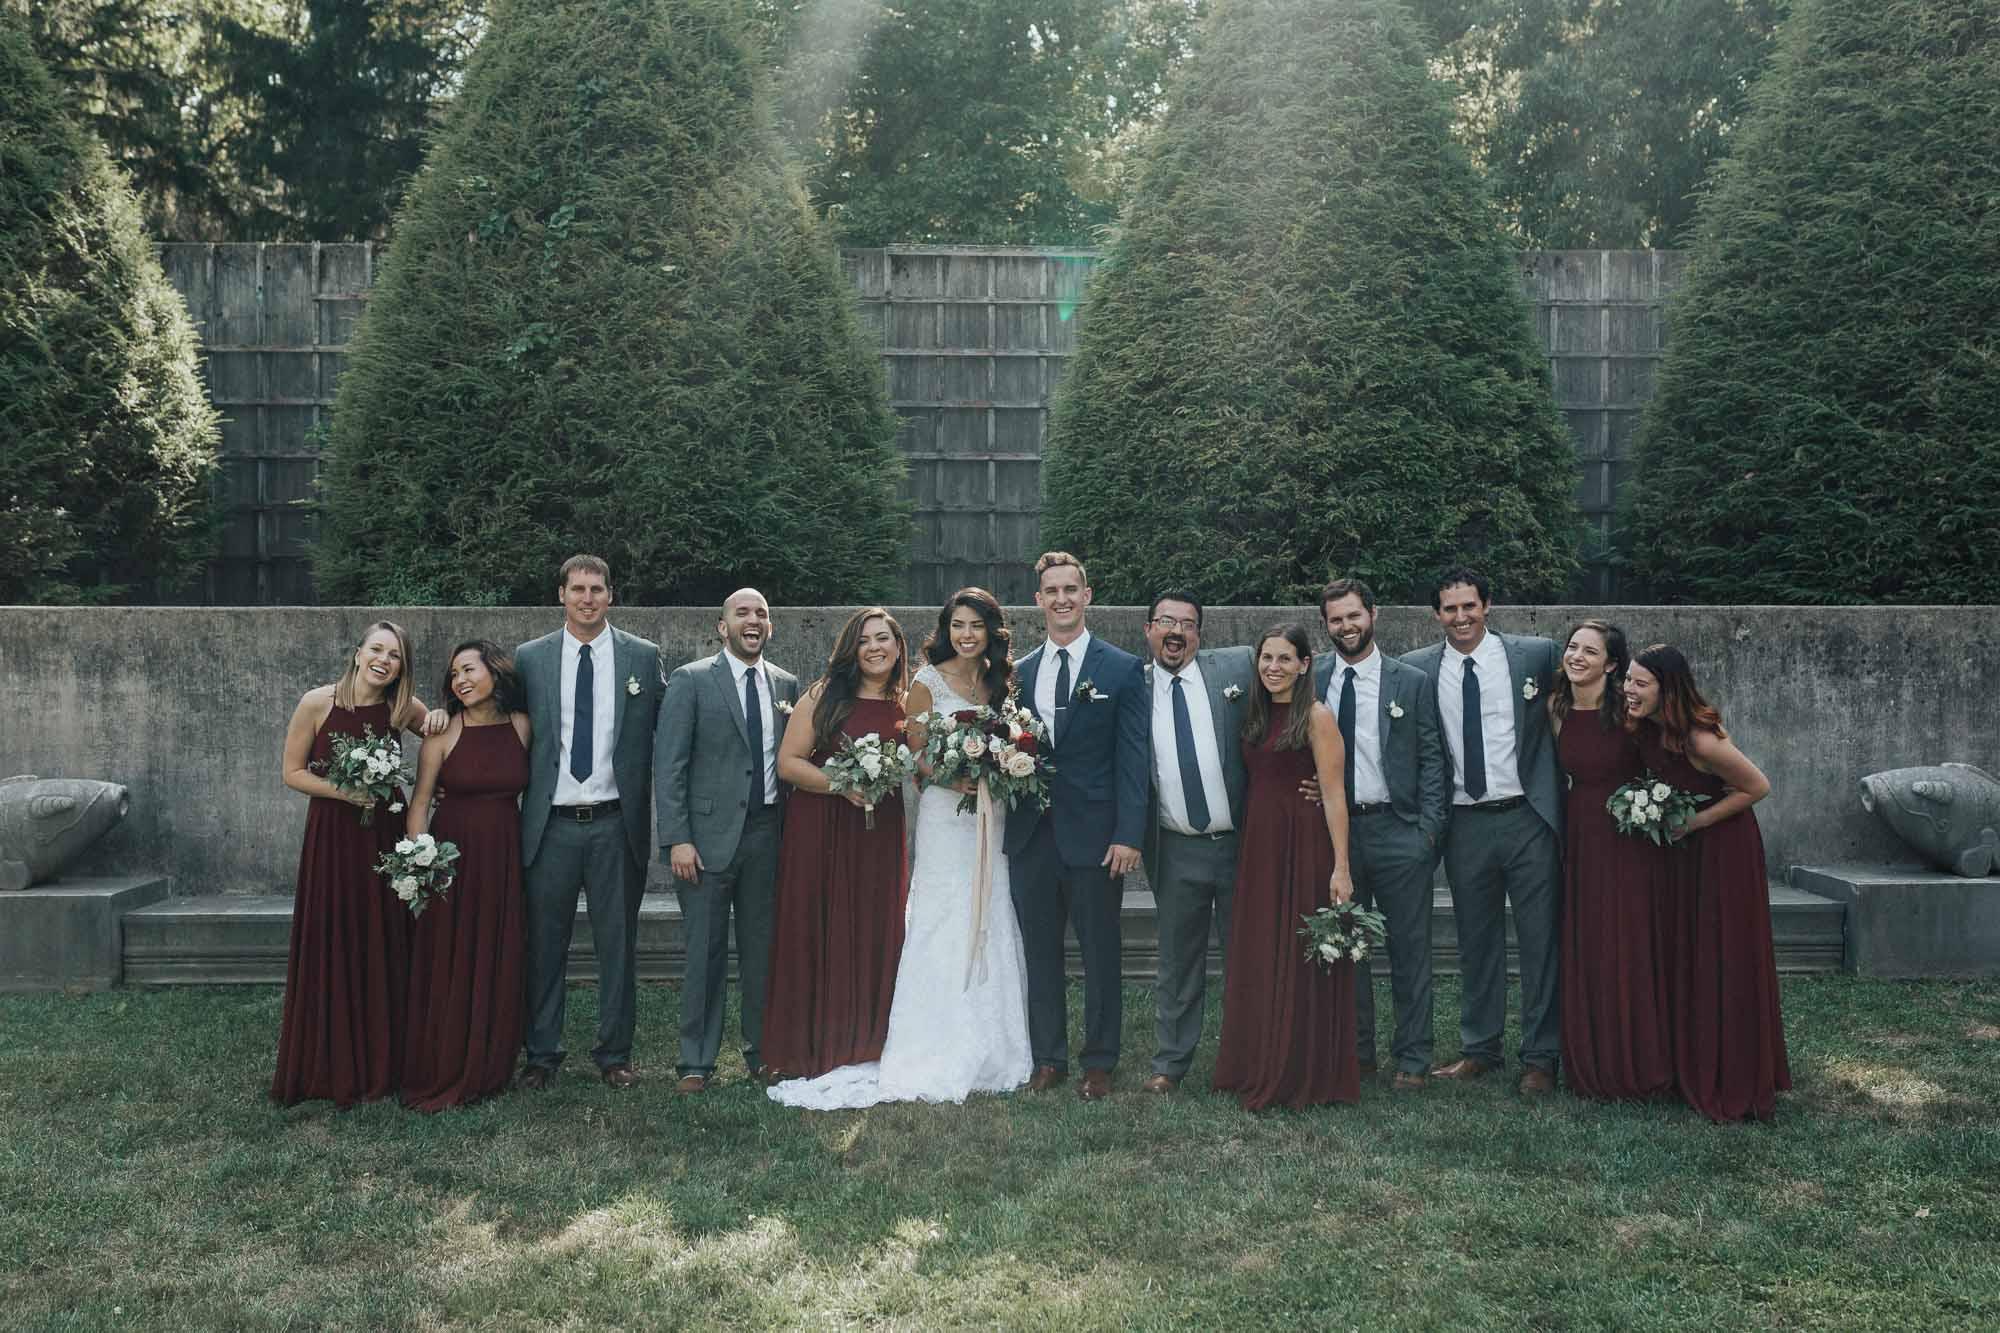 champaign_il_wedding_photography-0459.jpg